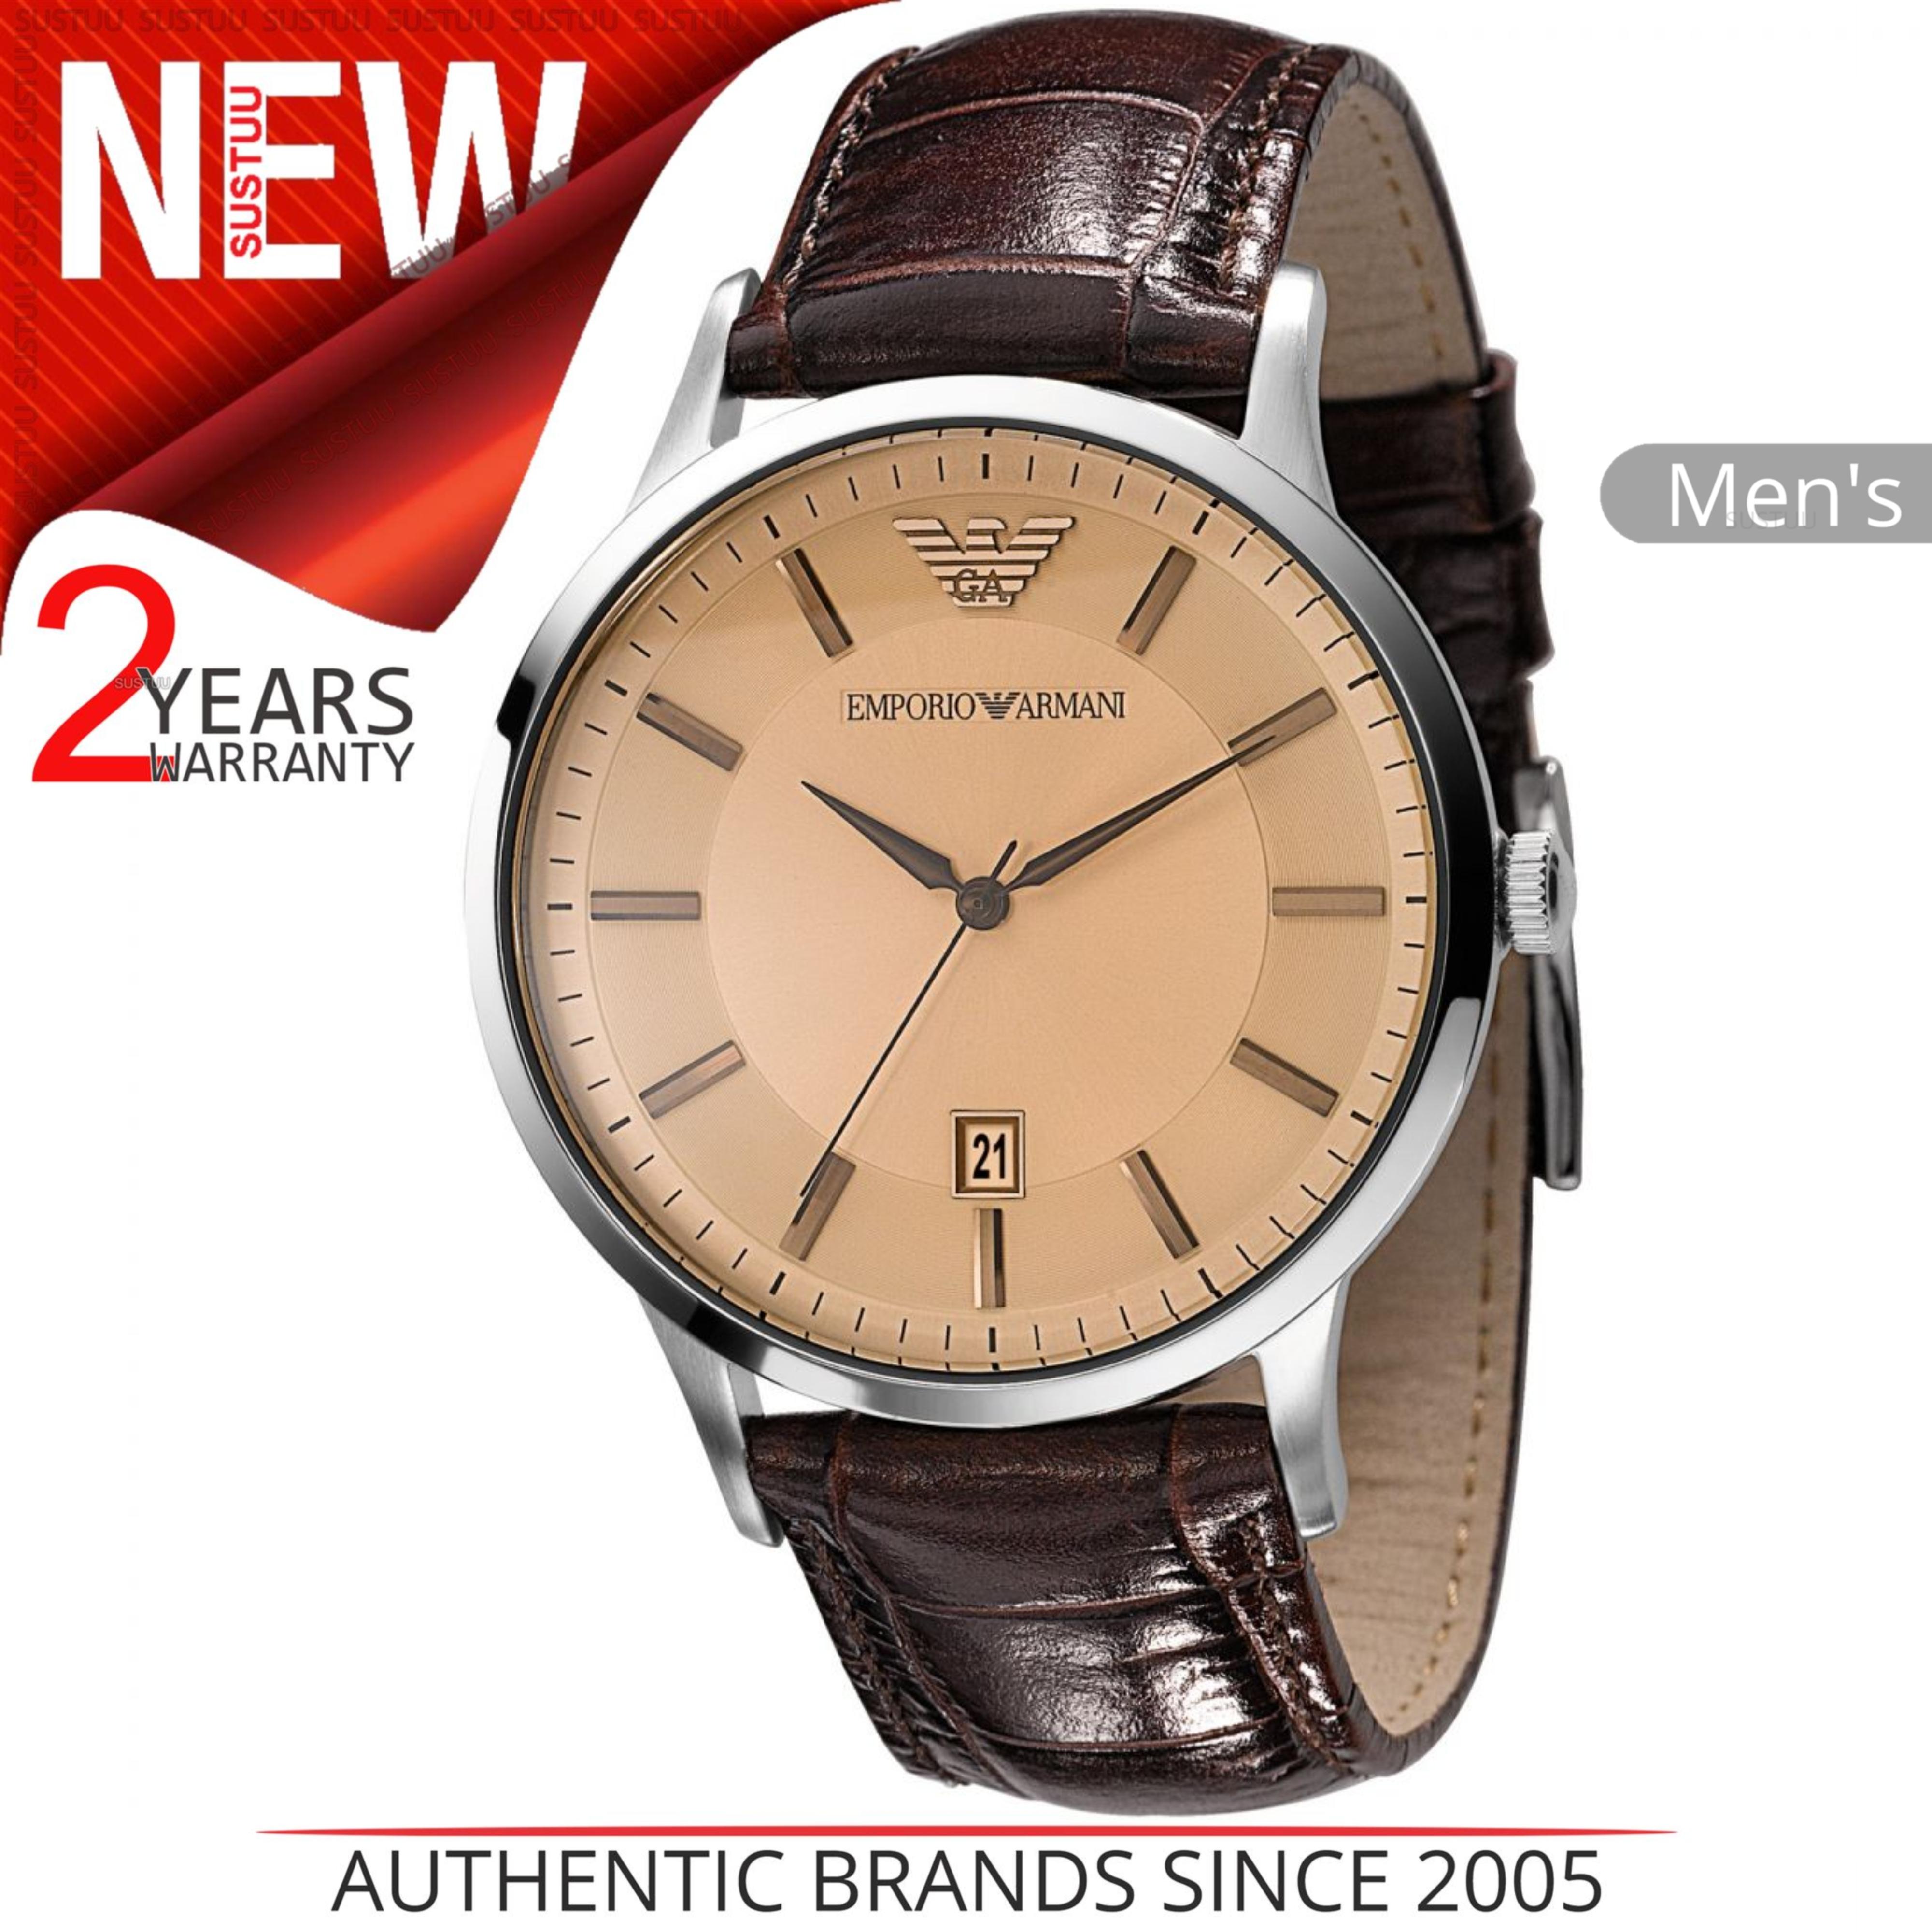 64858a7eb5de CENTINELA Reloj Emporio Armani Classic para hombre AR2427 Dial de color  salmón redondo Correa de cuero marrón